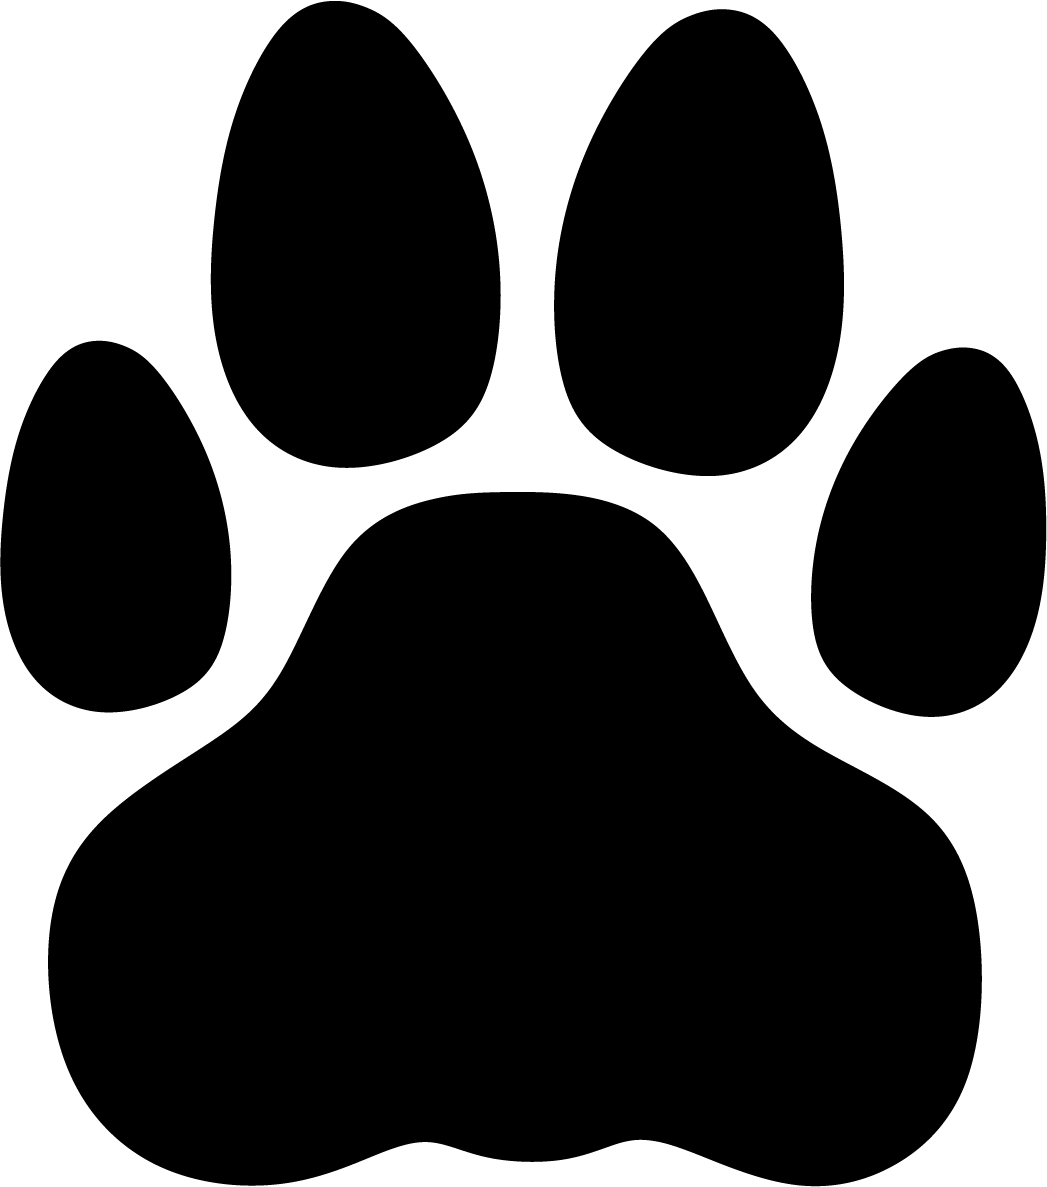 Tassu